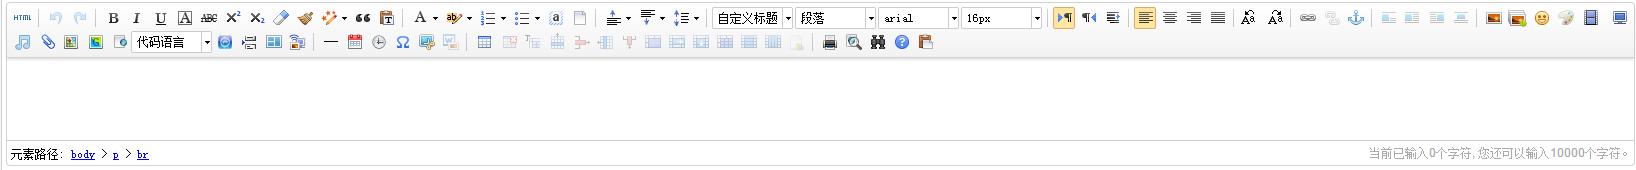 <b>dedecms使用百度编辑器简单的方法更换百度编辑器ueditor</b>